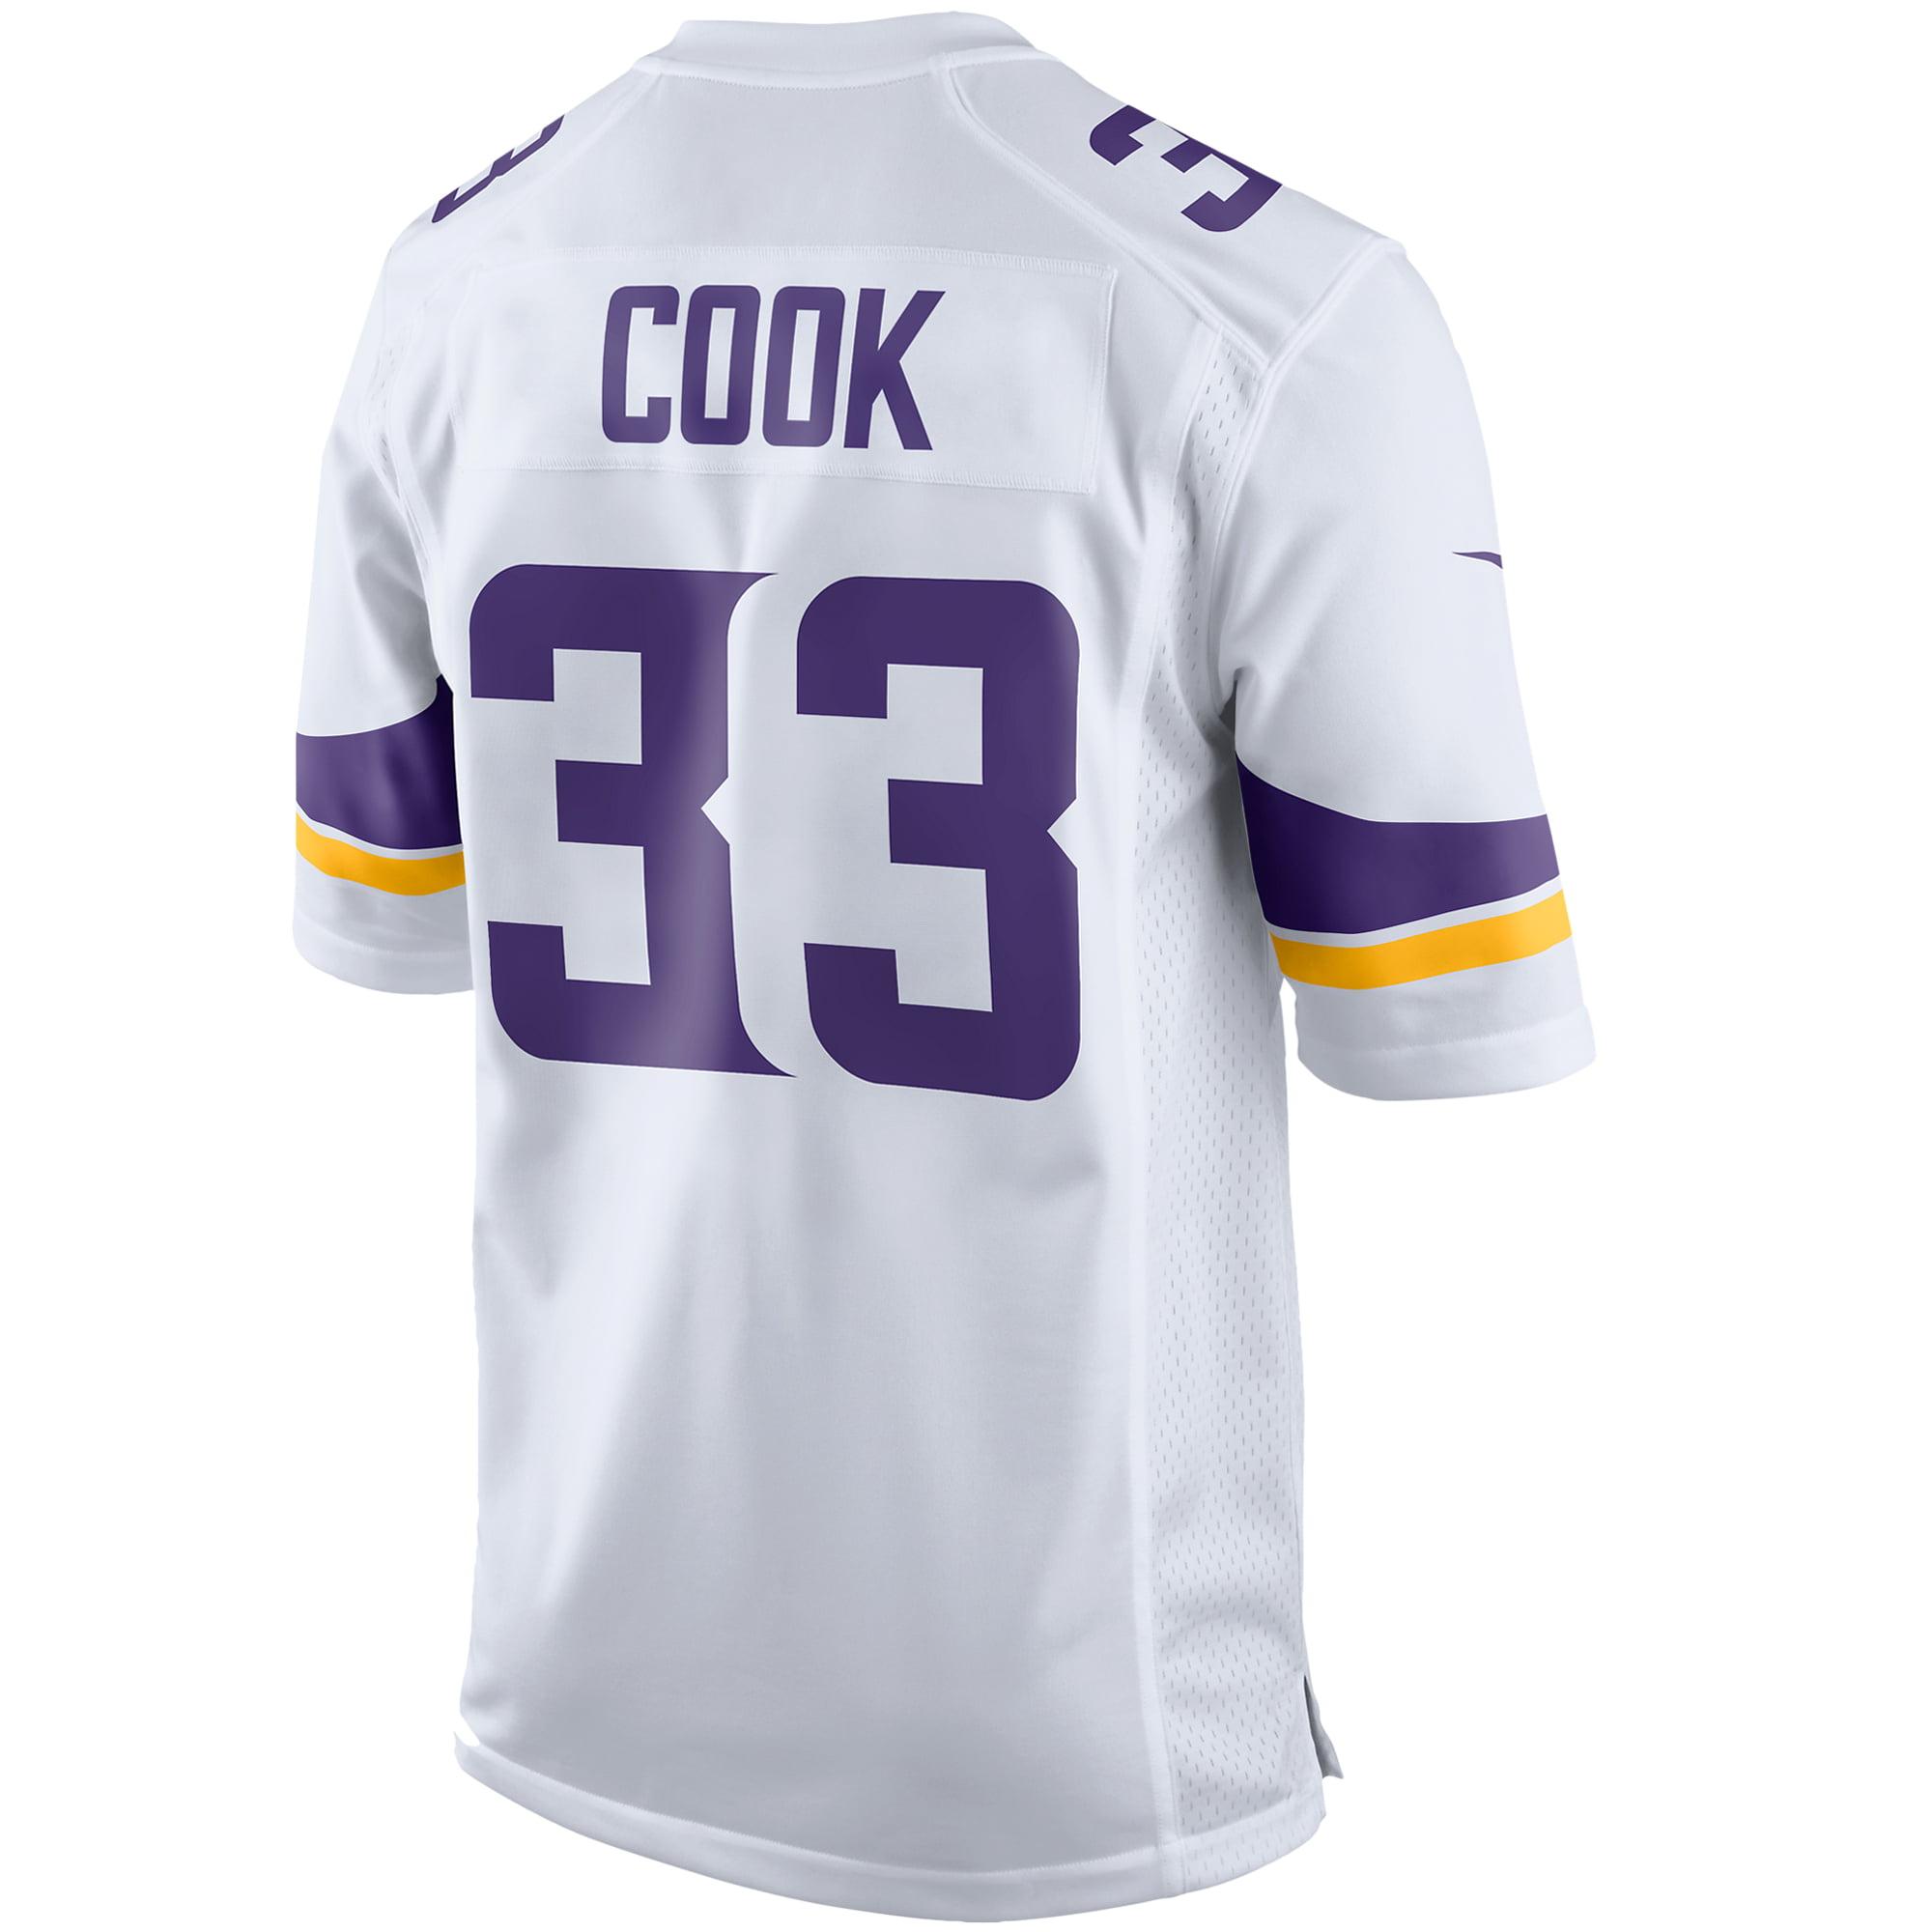 buy popular af97c 497ad Dalvin Cook Minnesota Vikings Nike Player Game Jersey - White